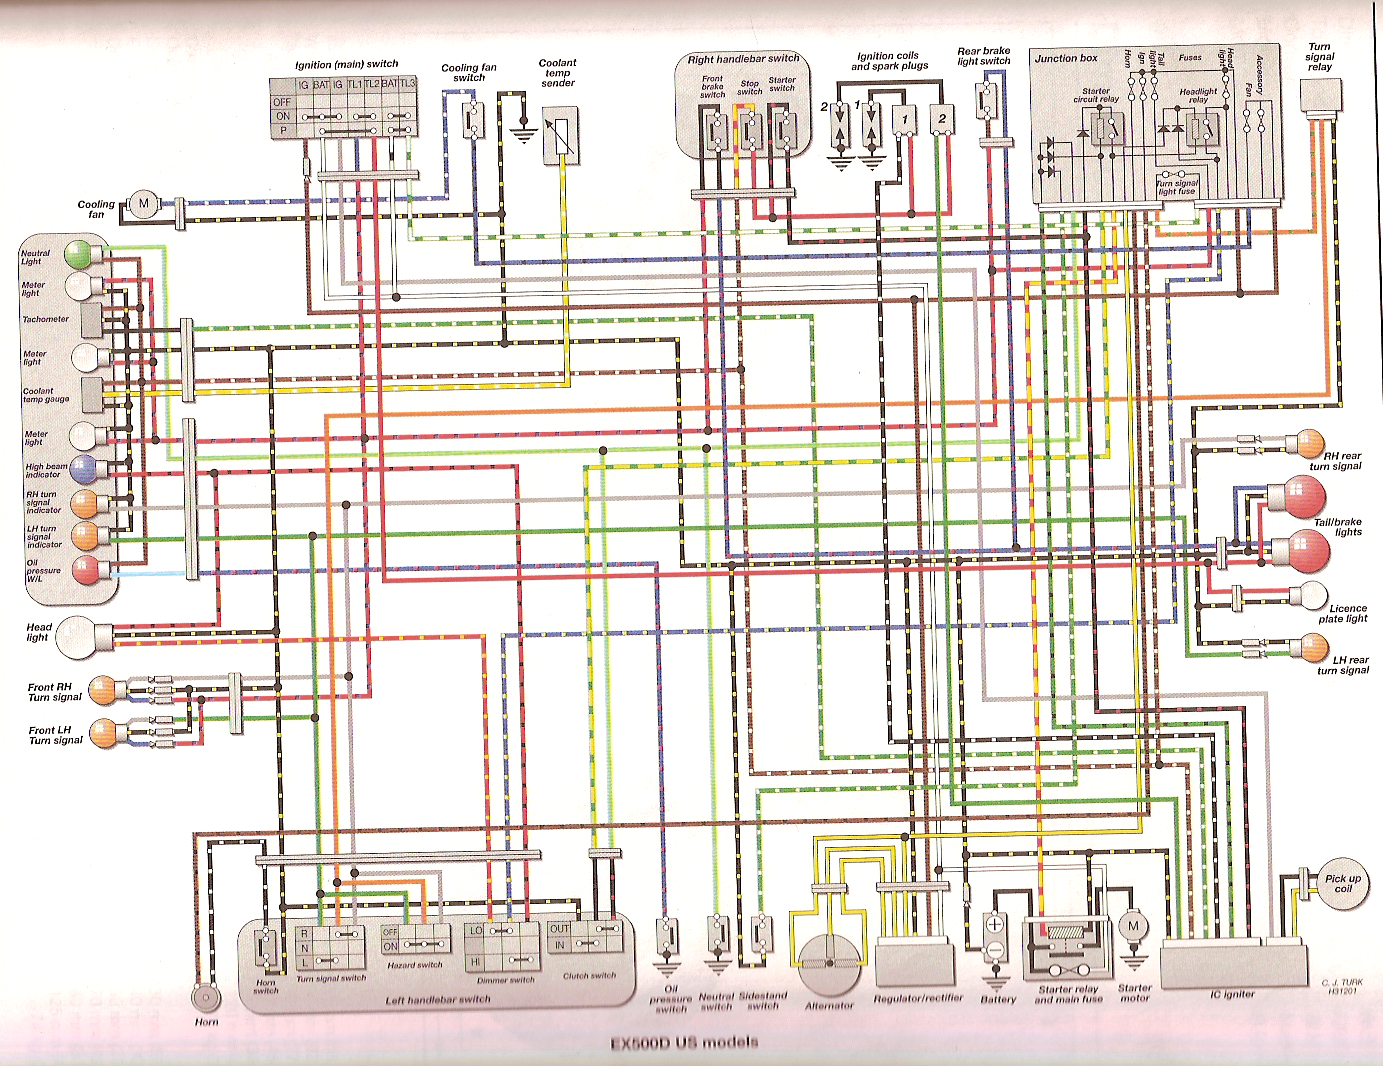 Super Wiring Diagram 2001 Kawasaki Zx 12R Wiring Library Wiring Cloud Overrenstrafr09Org